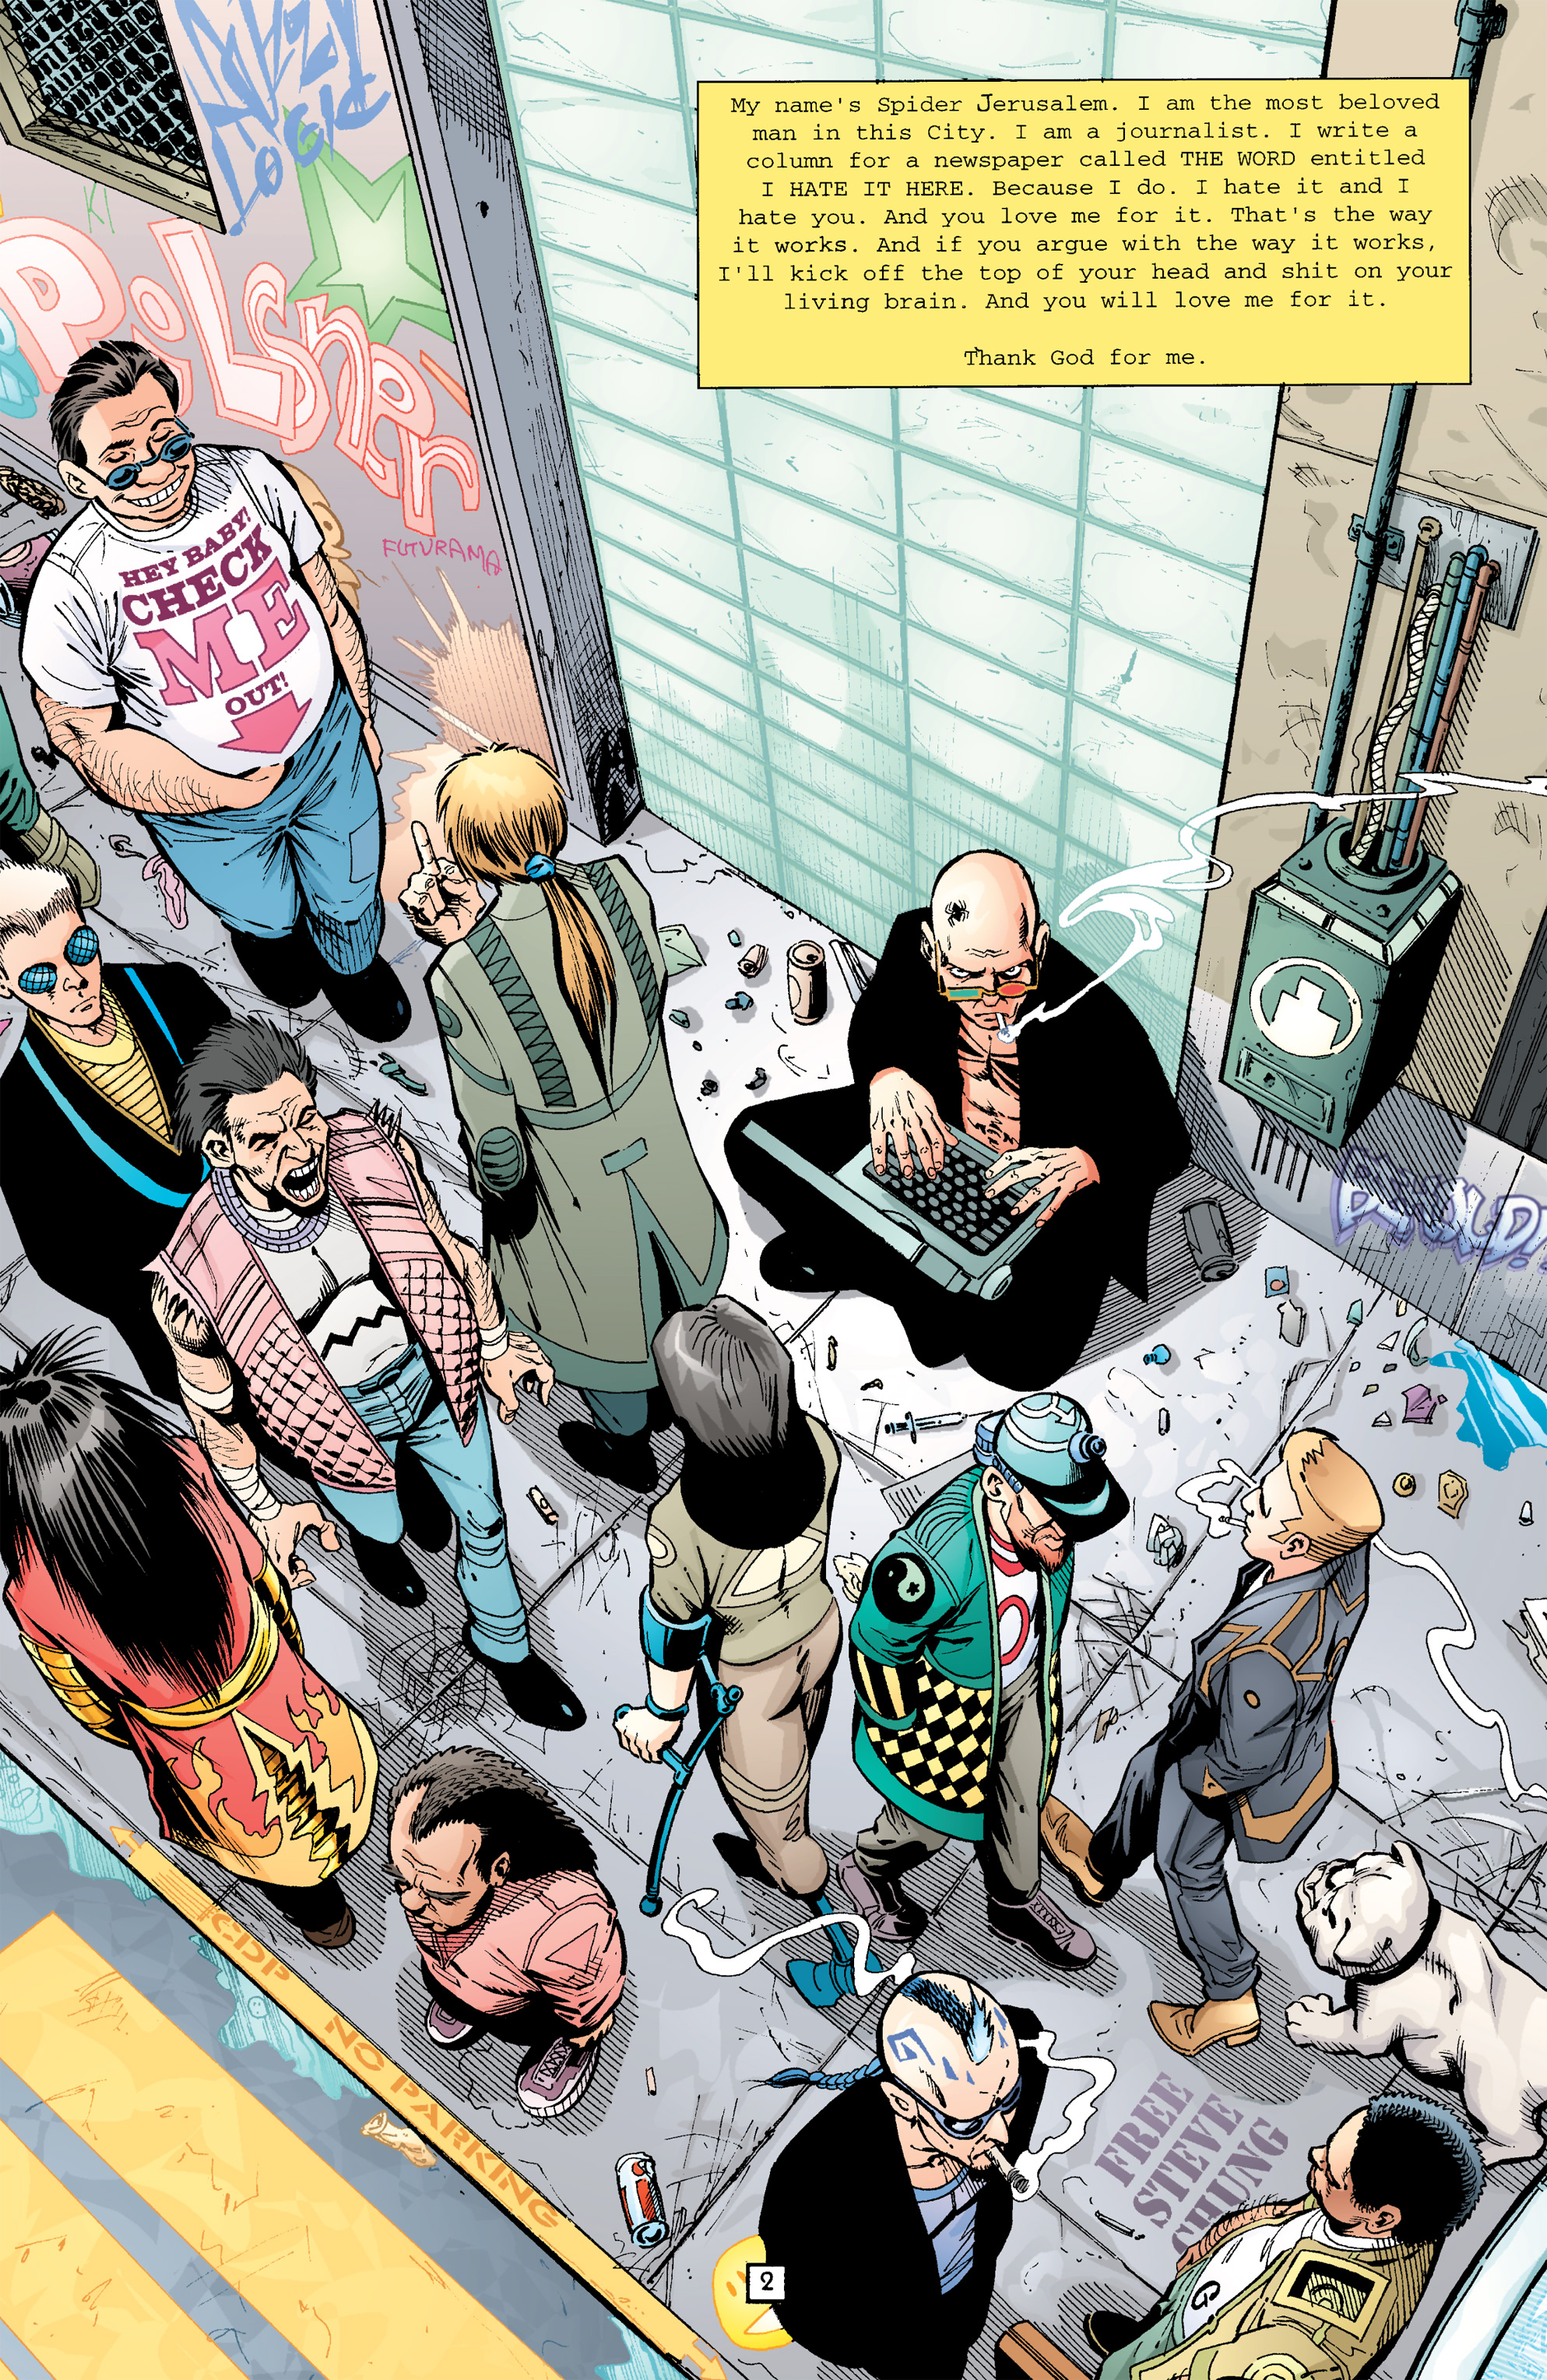 Read online Transmetropolitan comic -  Issue #26 - 3